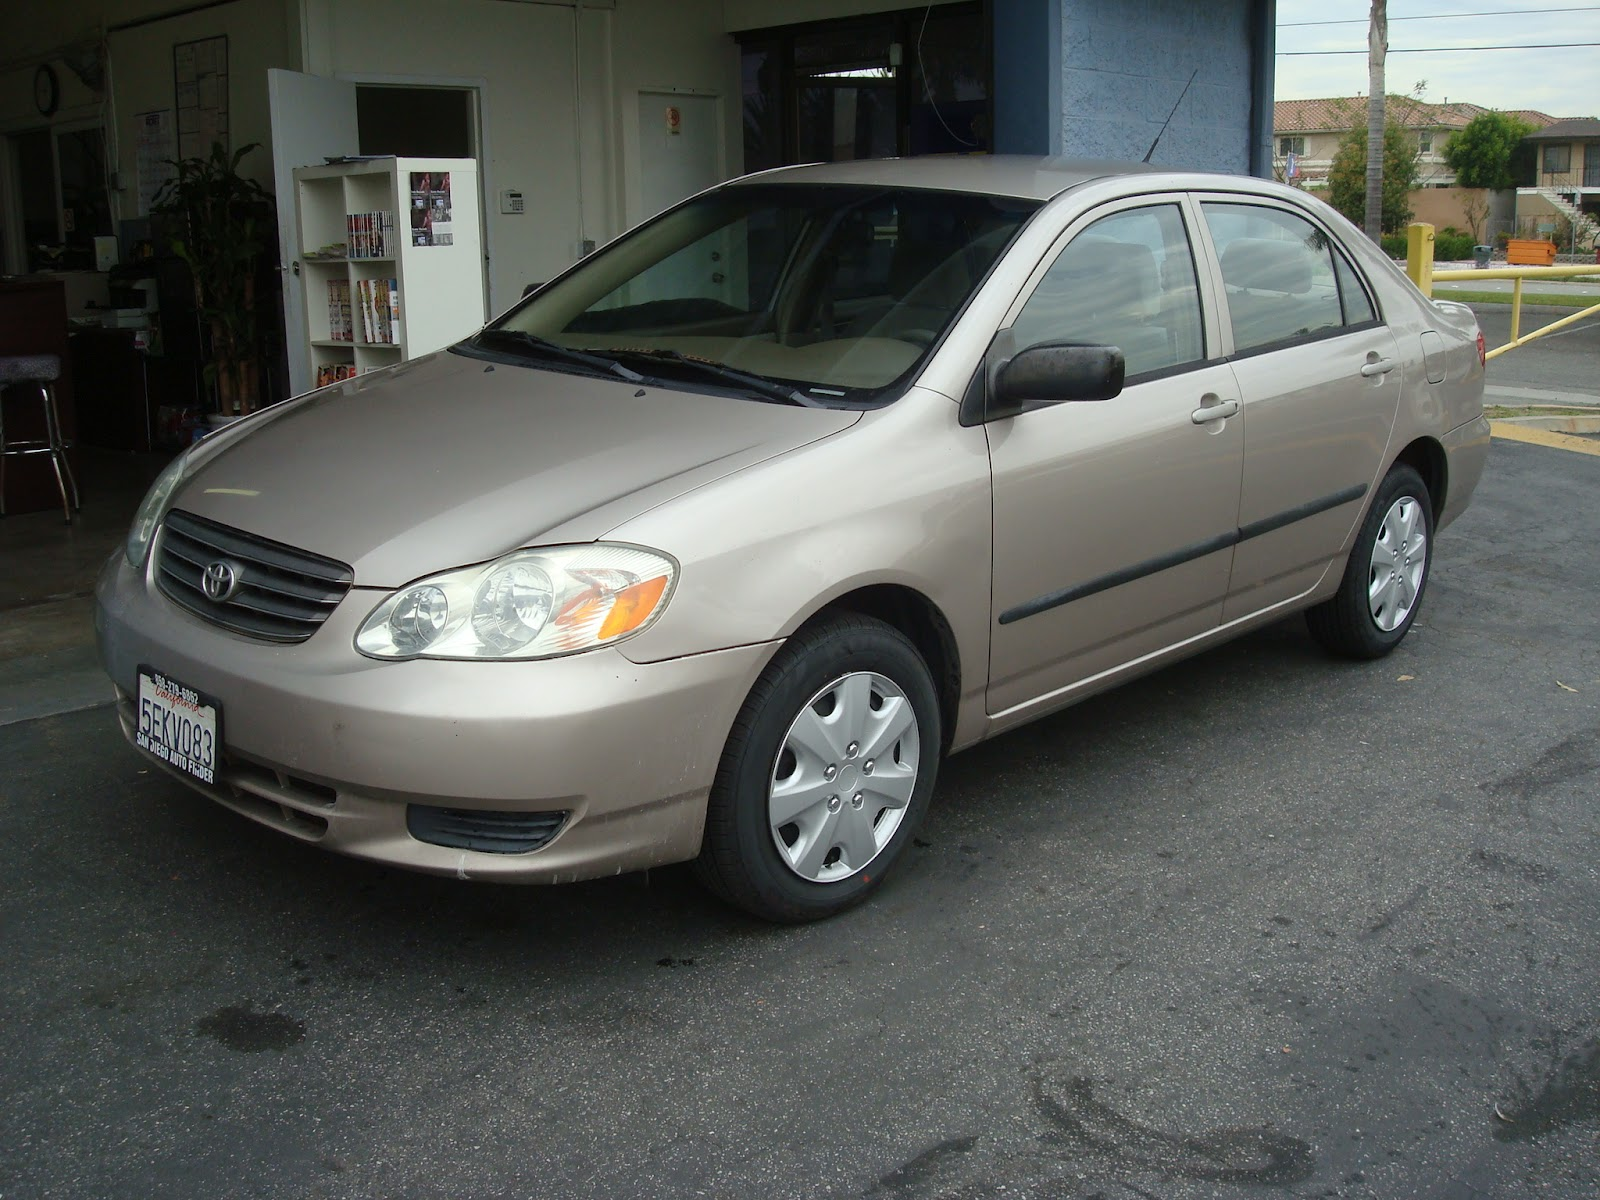 [2003] Toyota - Corolla CE (Gold)